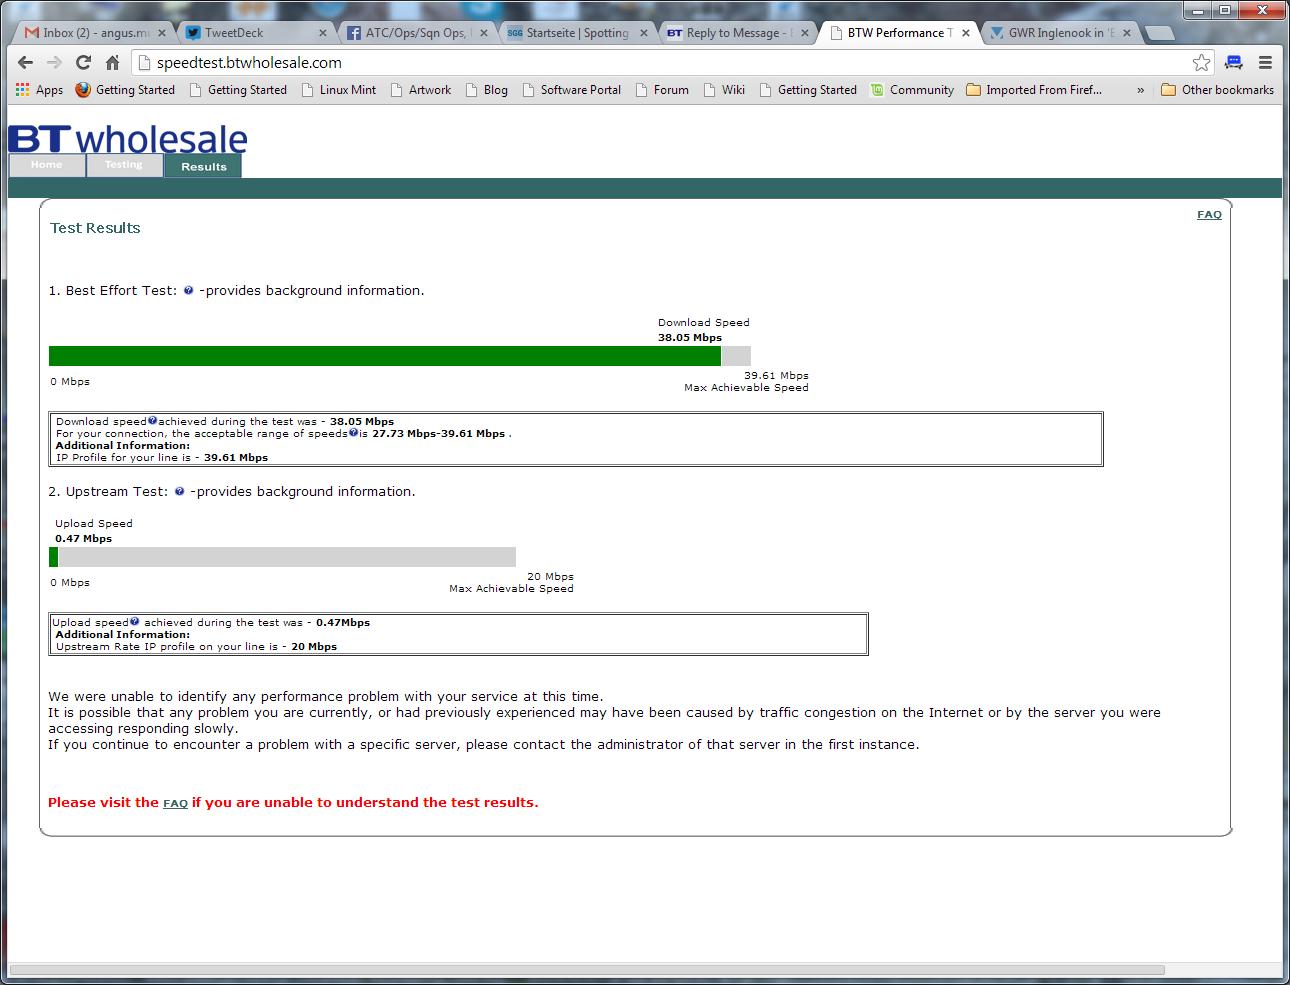 Screenshot 2014-03-02 14.07.44.png